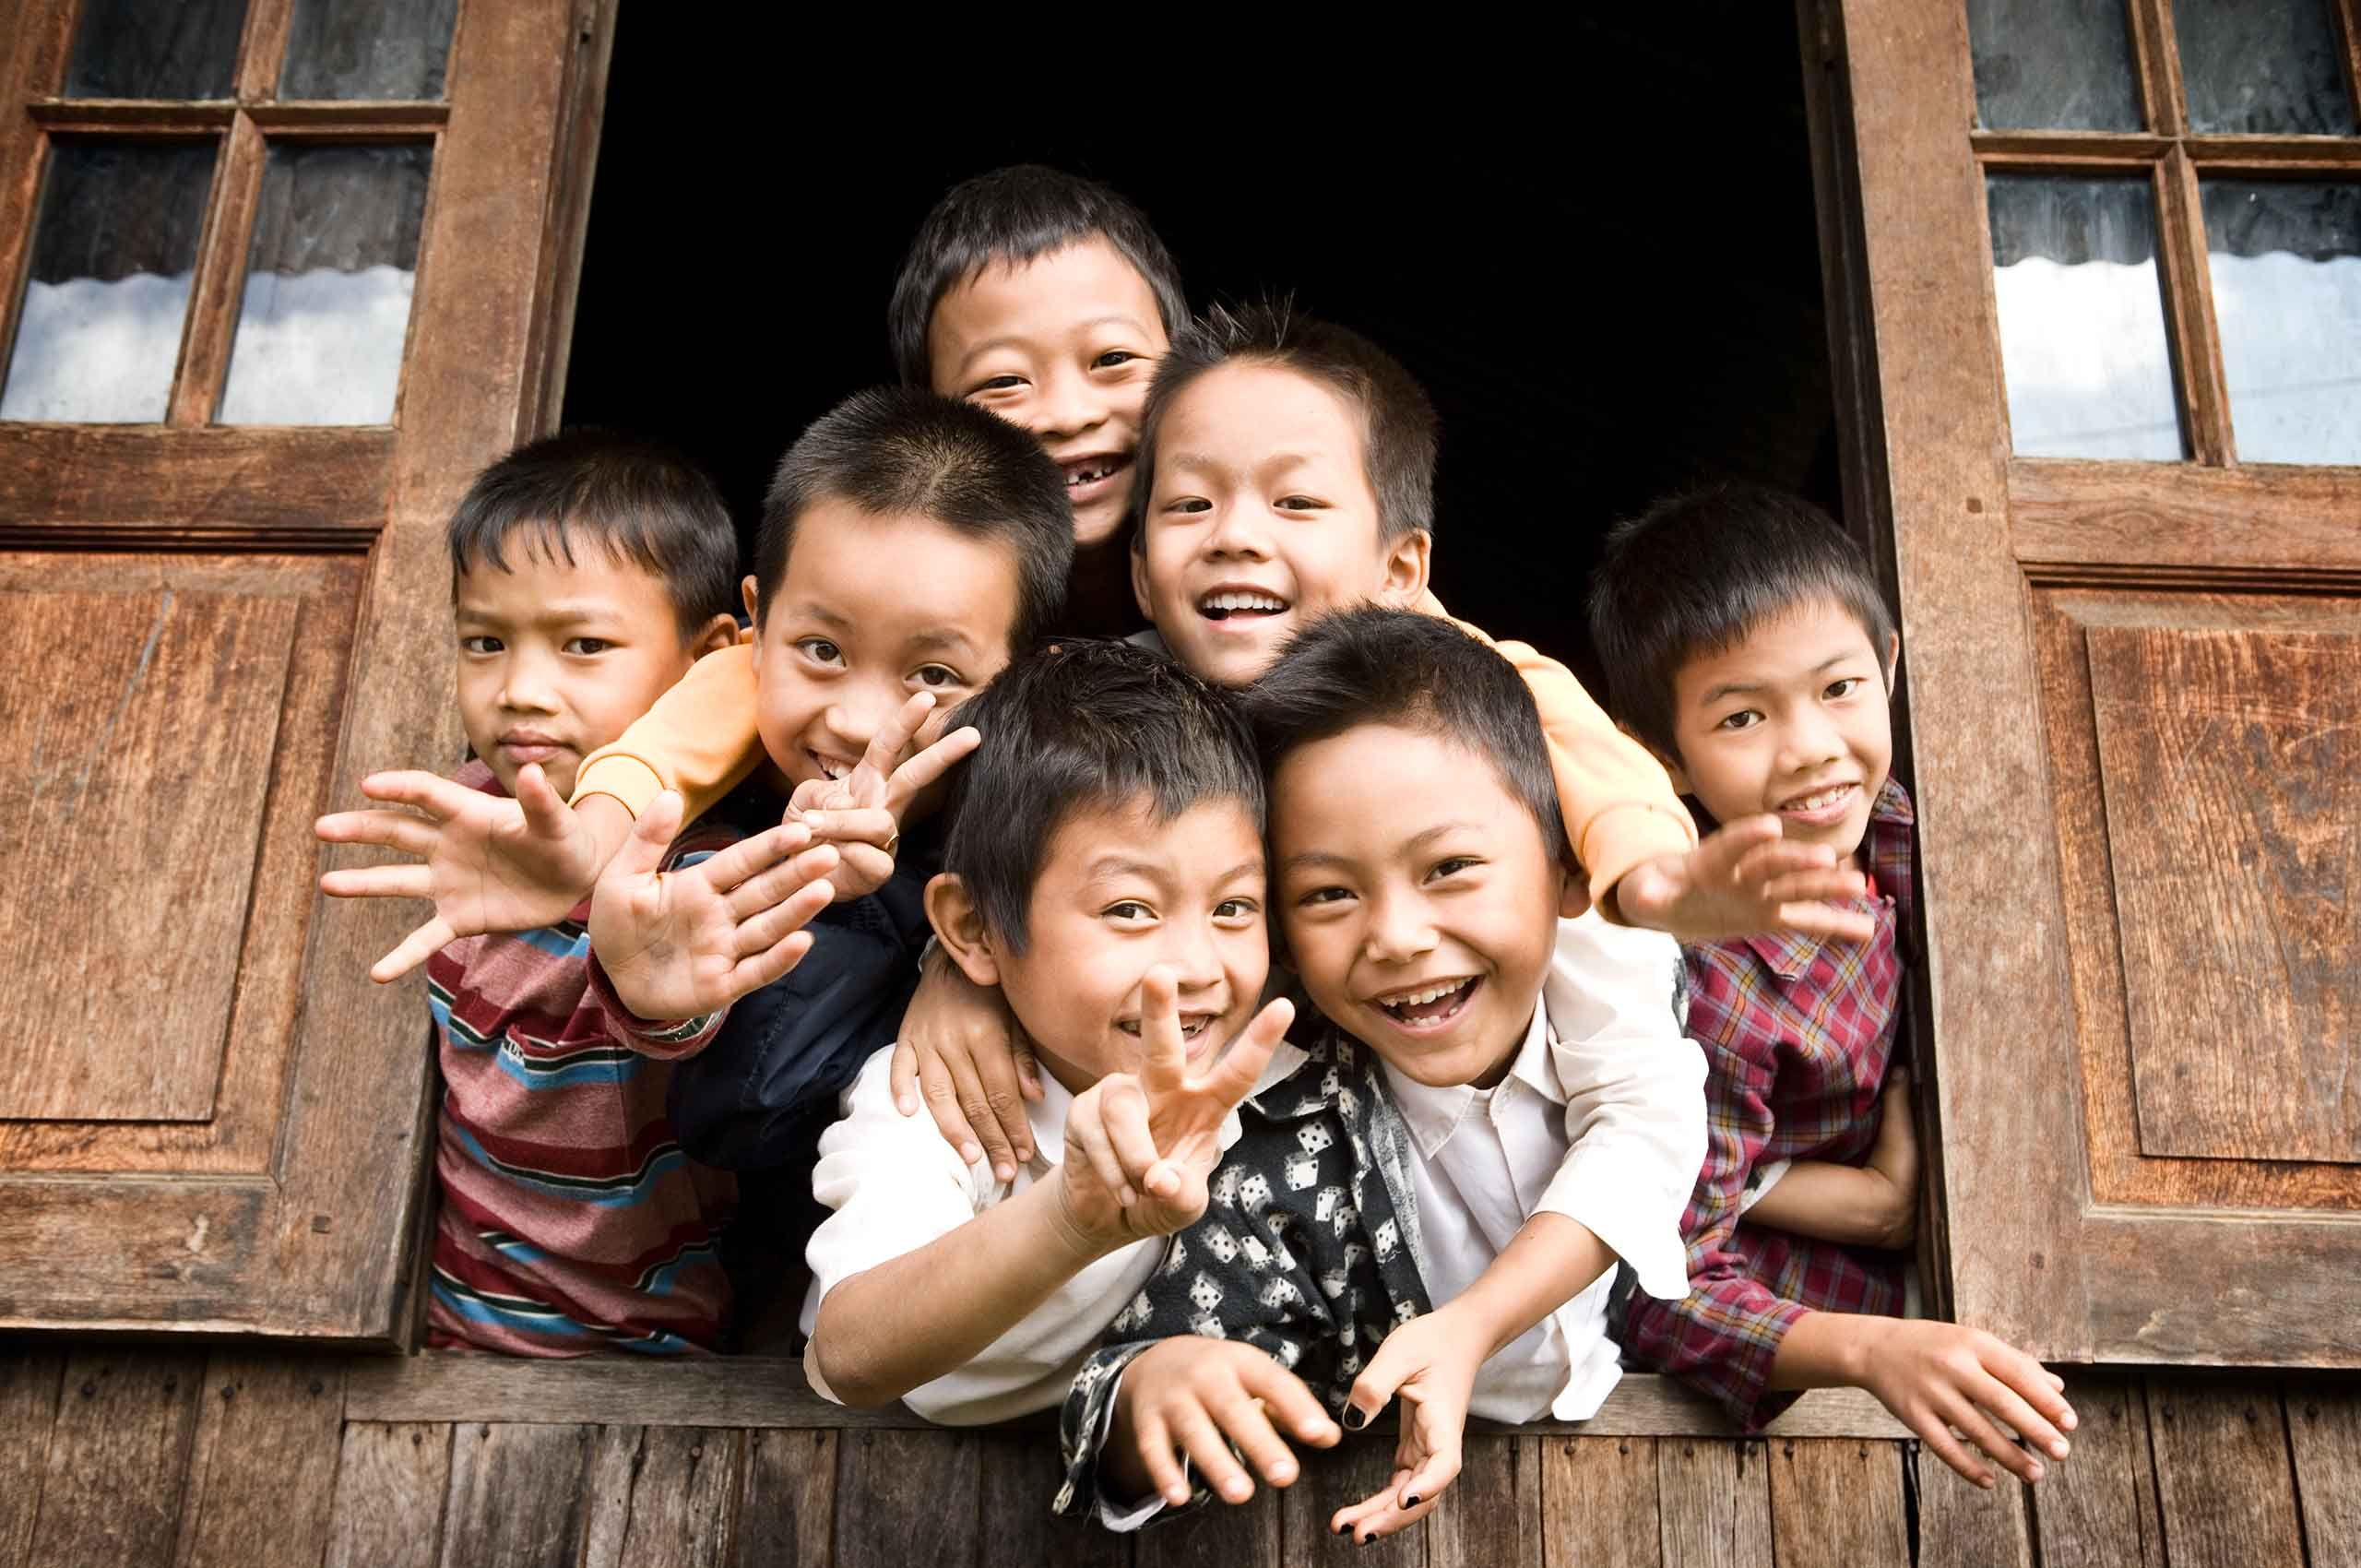 schoolboys-lakeinle-myanmar-by-henrikolundphotography.jpg